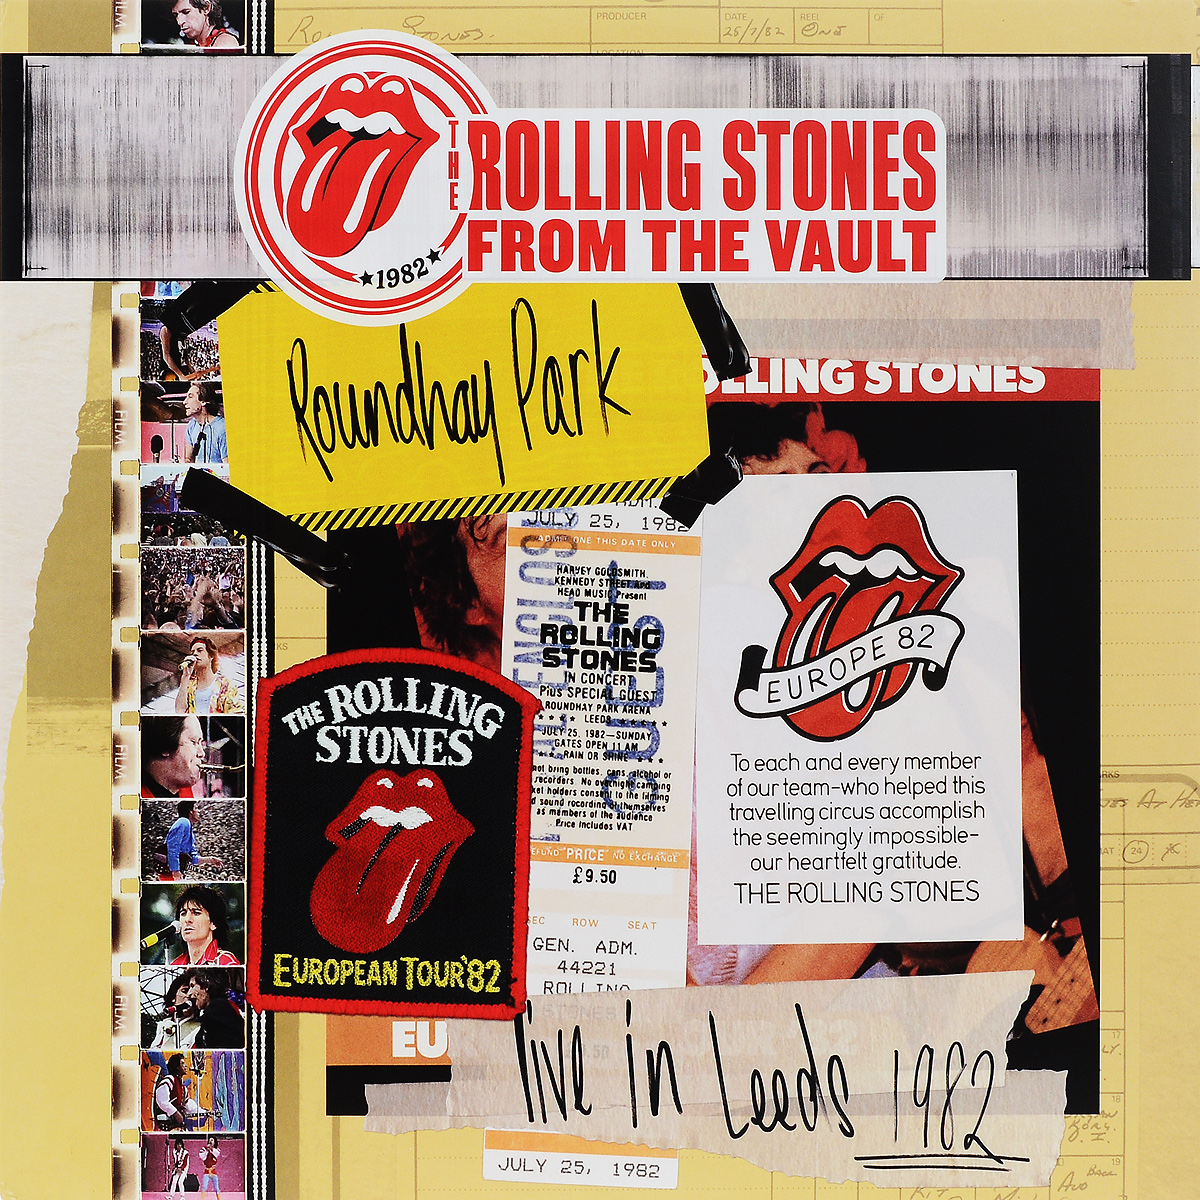 The Rolling Stones The Rolling Stones. Live In Leeds 1982 (3 LP + DVD) cd dvd lp fleetwood mac tango in the night